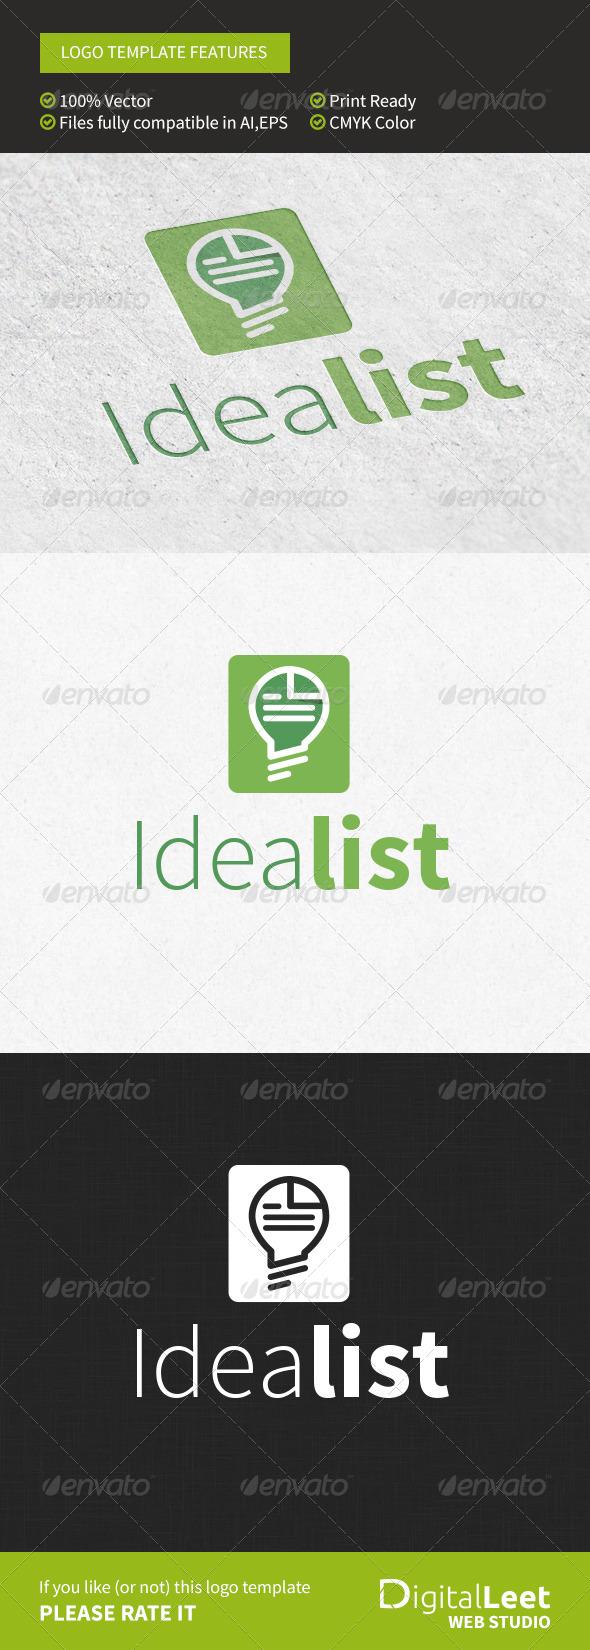 GraphicRiver Idealist Logo Template 8754065